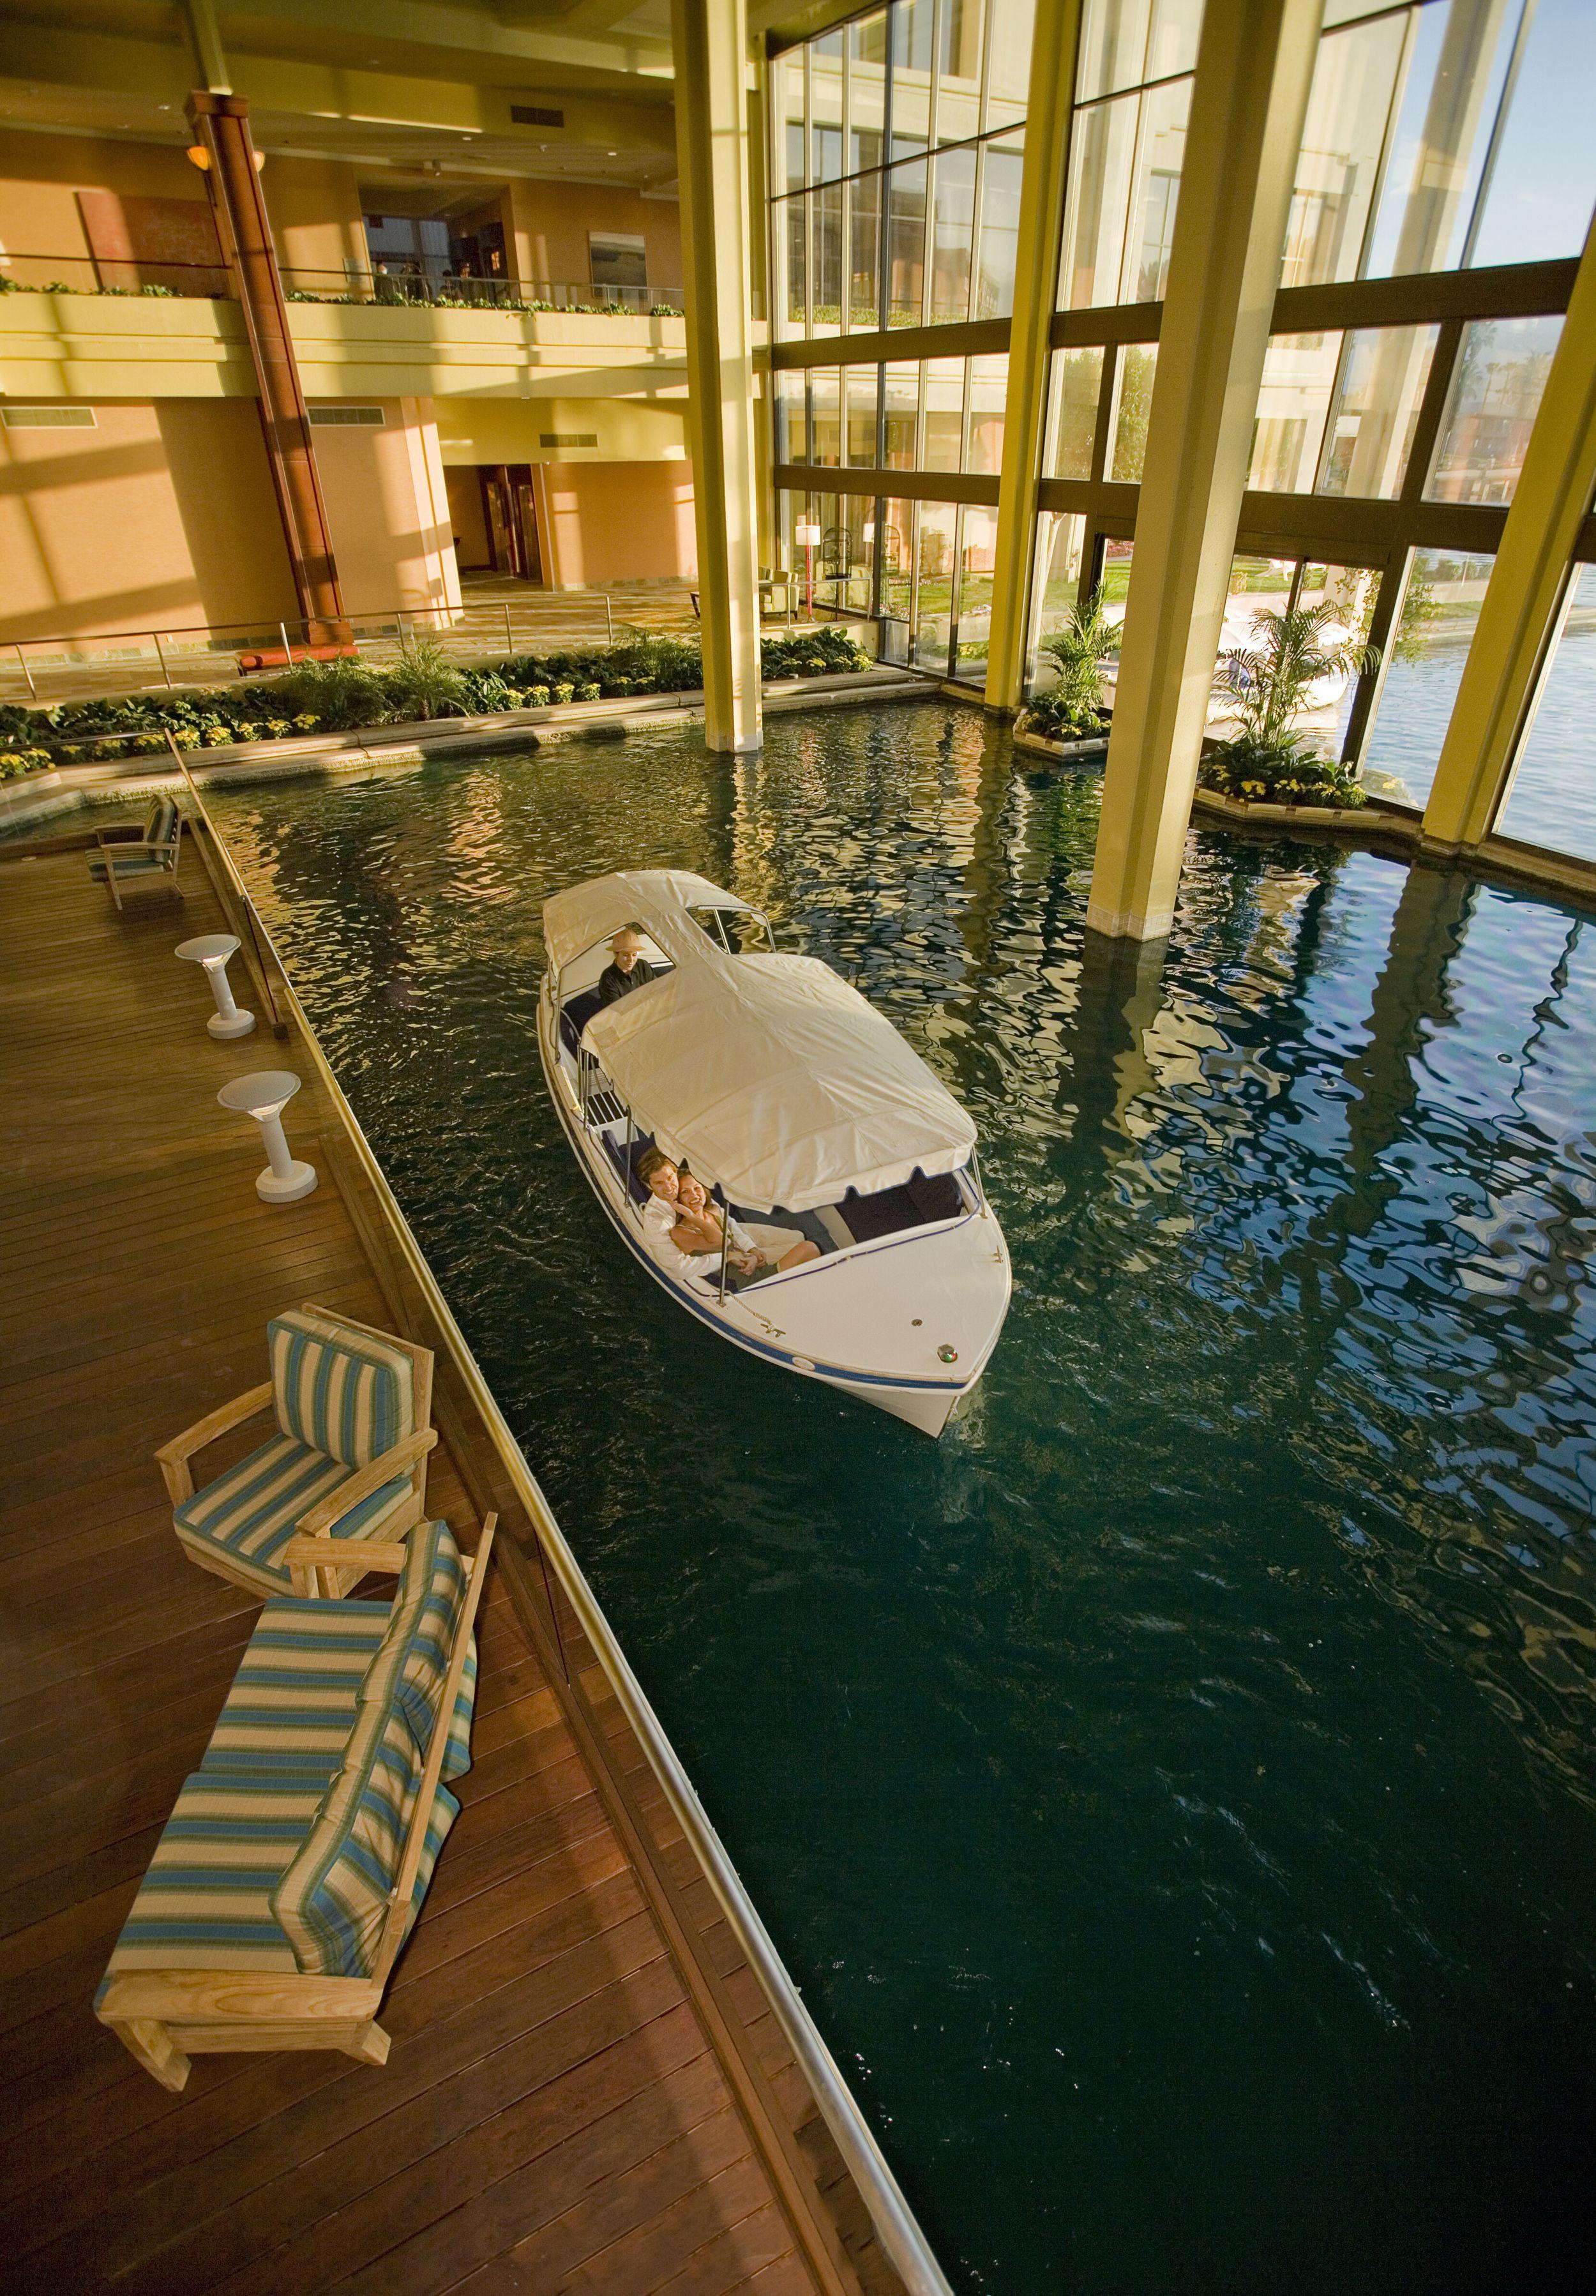 Boat dock - inside the Desert Springs Marriott! There was ...